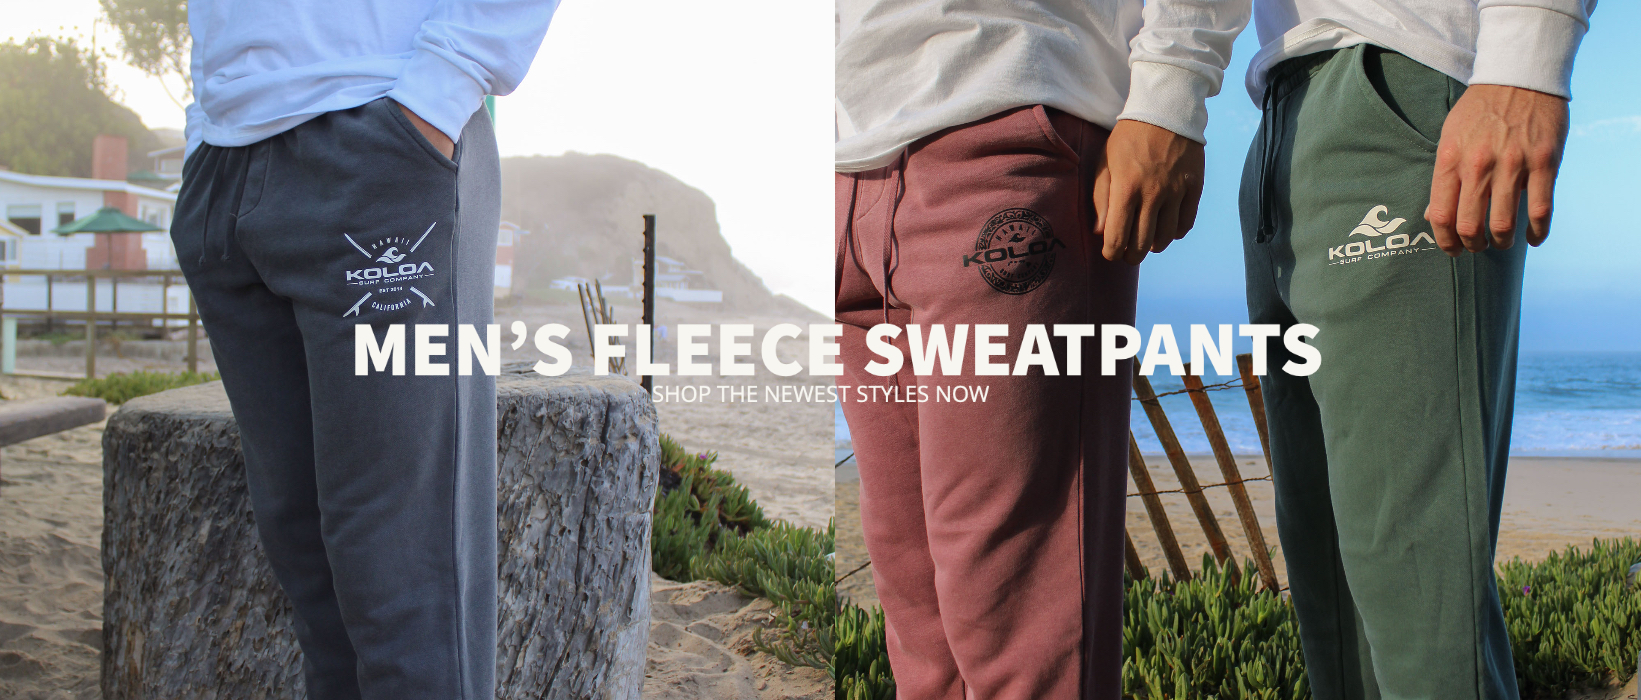 Shop men's fleece sweatpants. The newest fleece sweatpants styles.